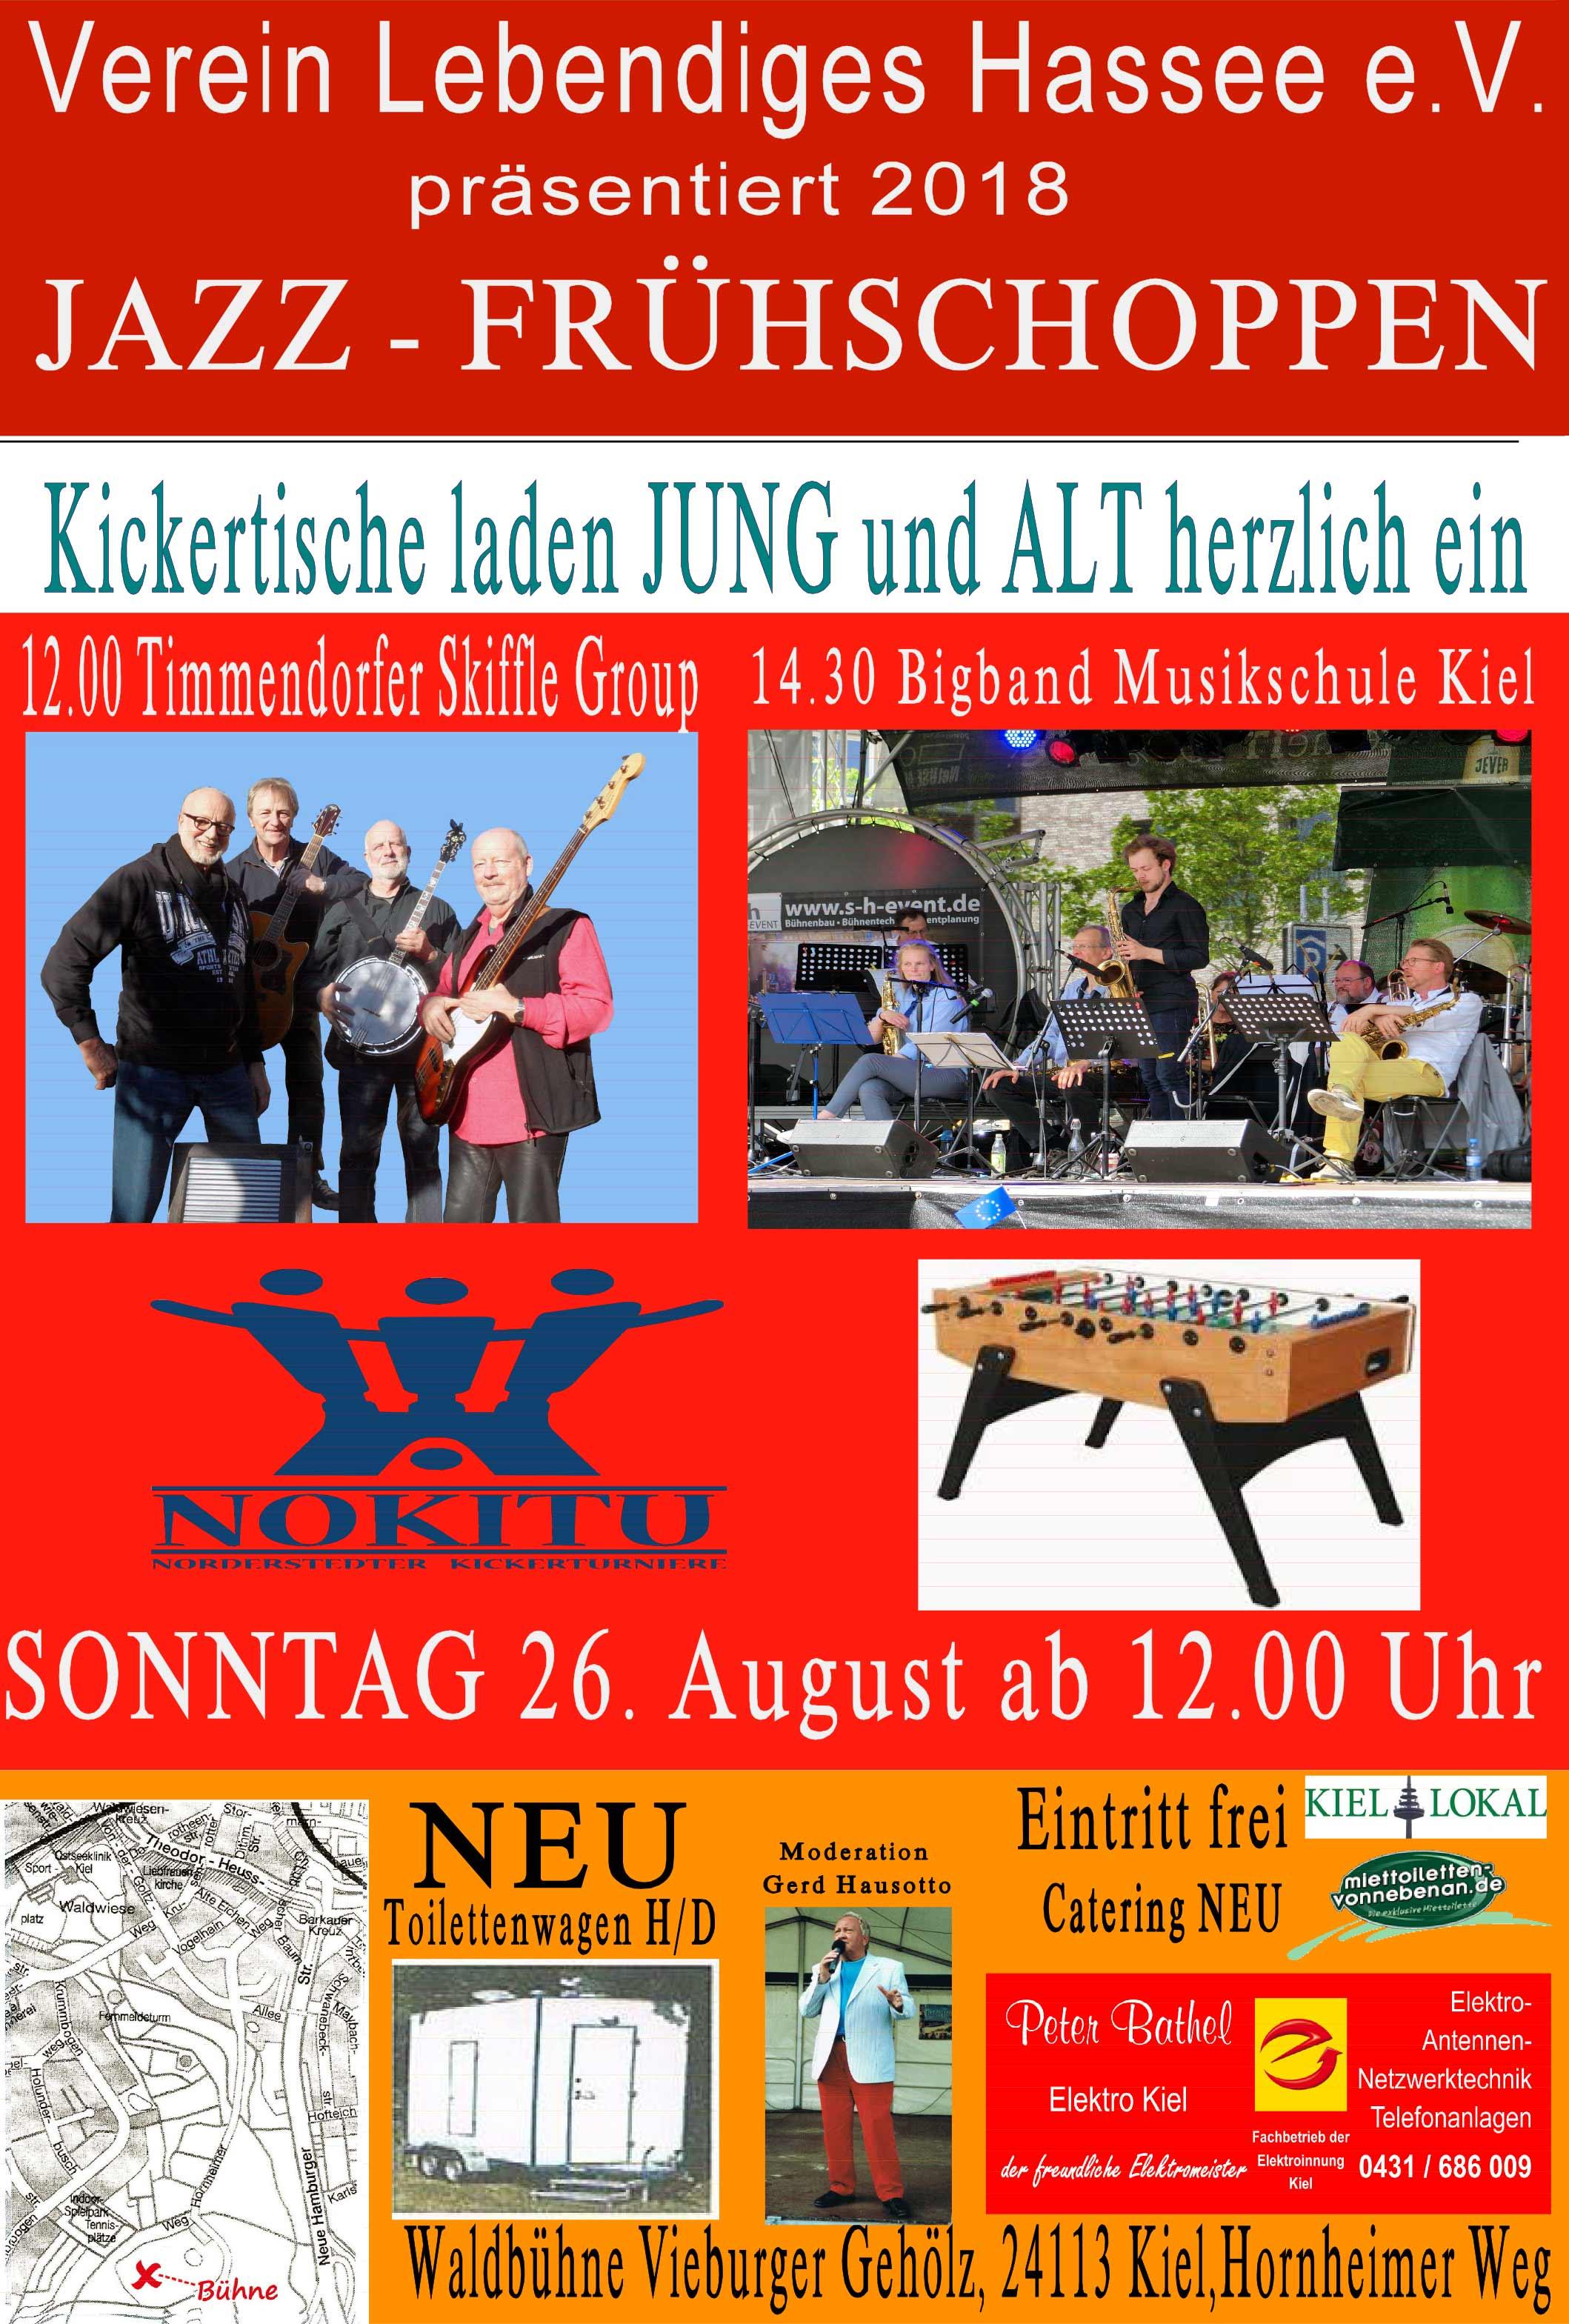 http://www.lebendigeshassee.de/media/image/Plakat-LH-2018.jpg